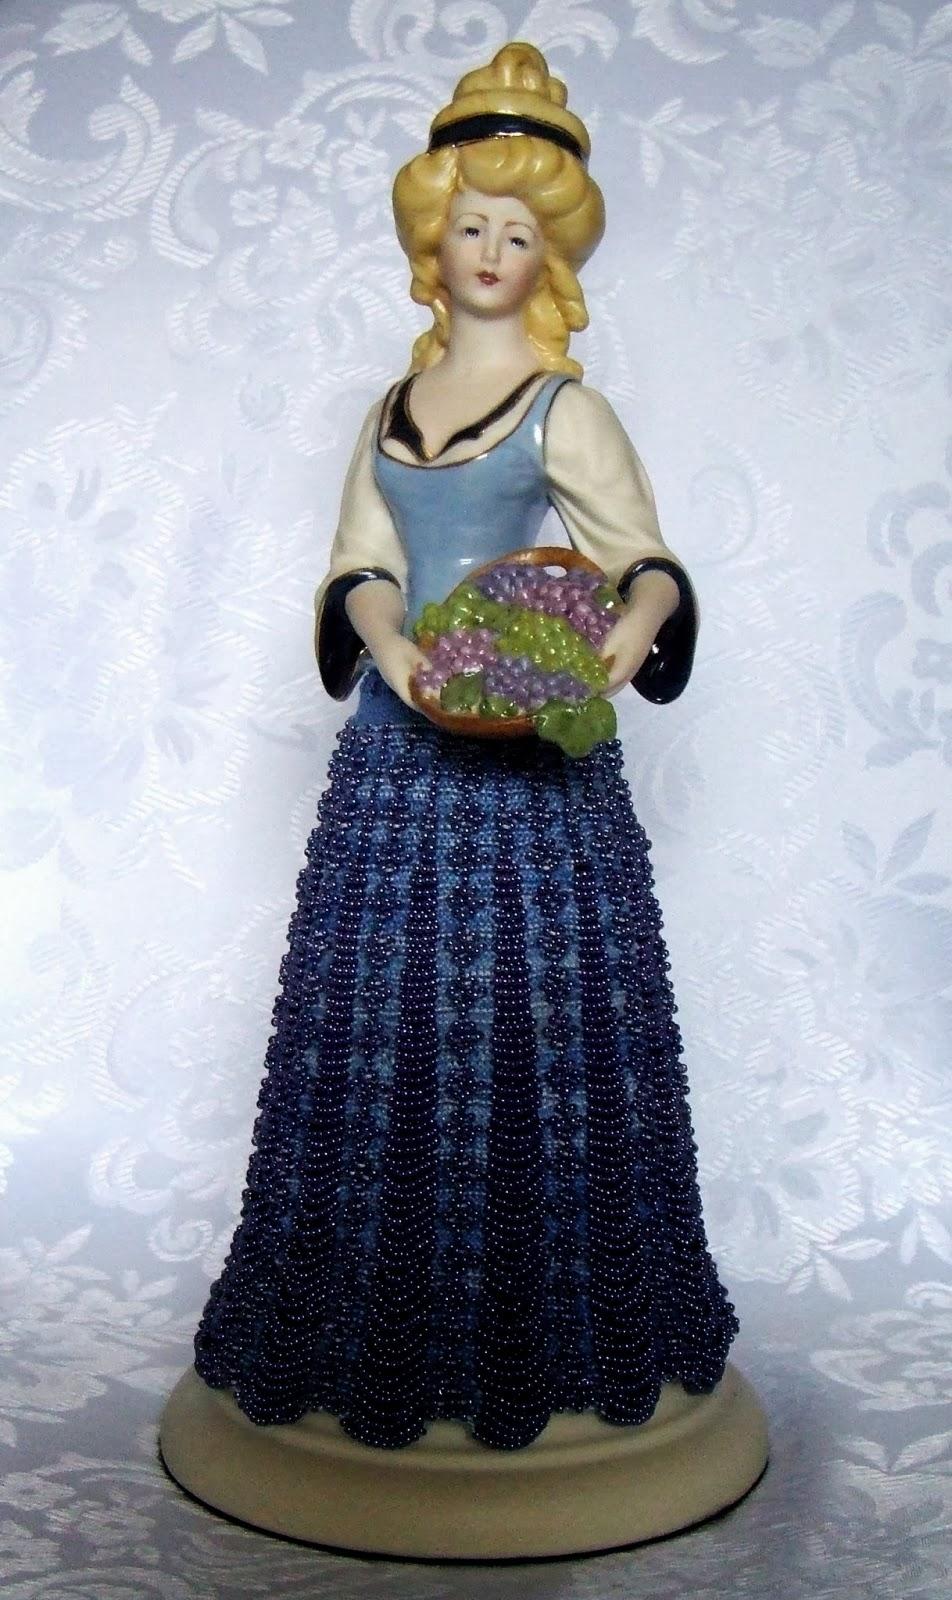 Beaded Knitting Patterns Half Dolls : Beading Belles: Bead Knitting Service For Half Doll Skirts